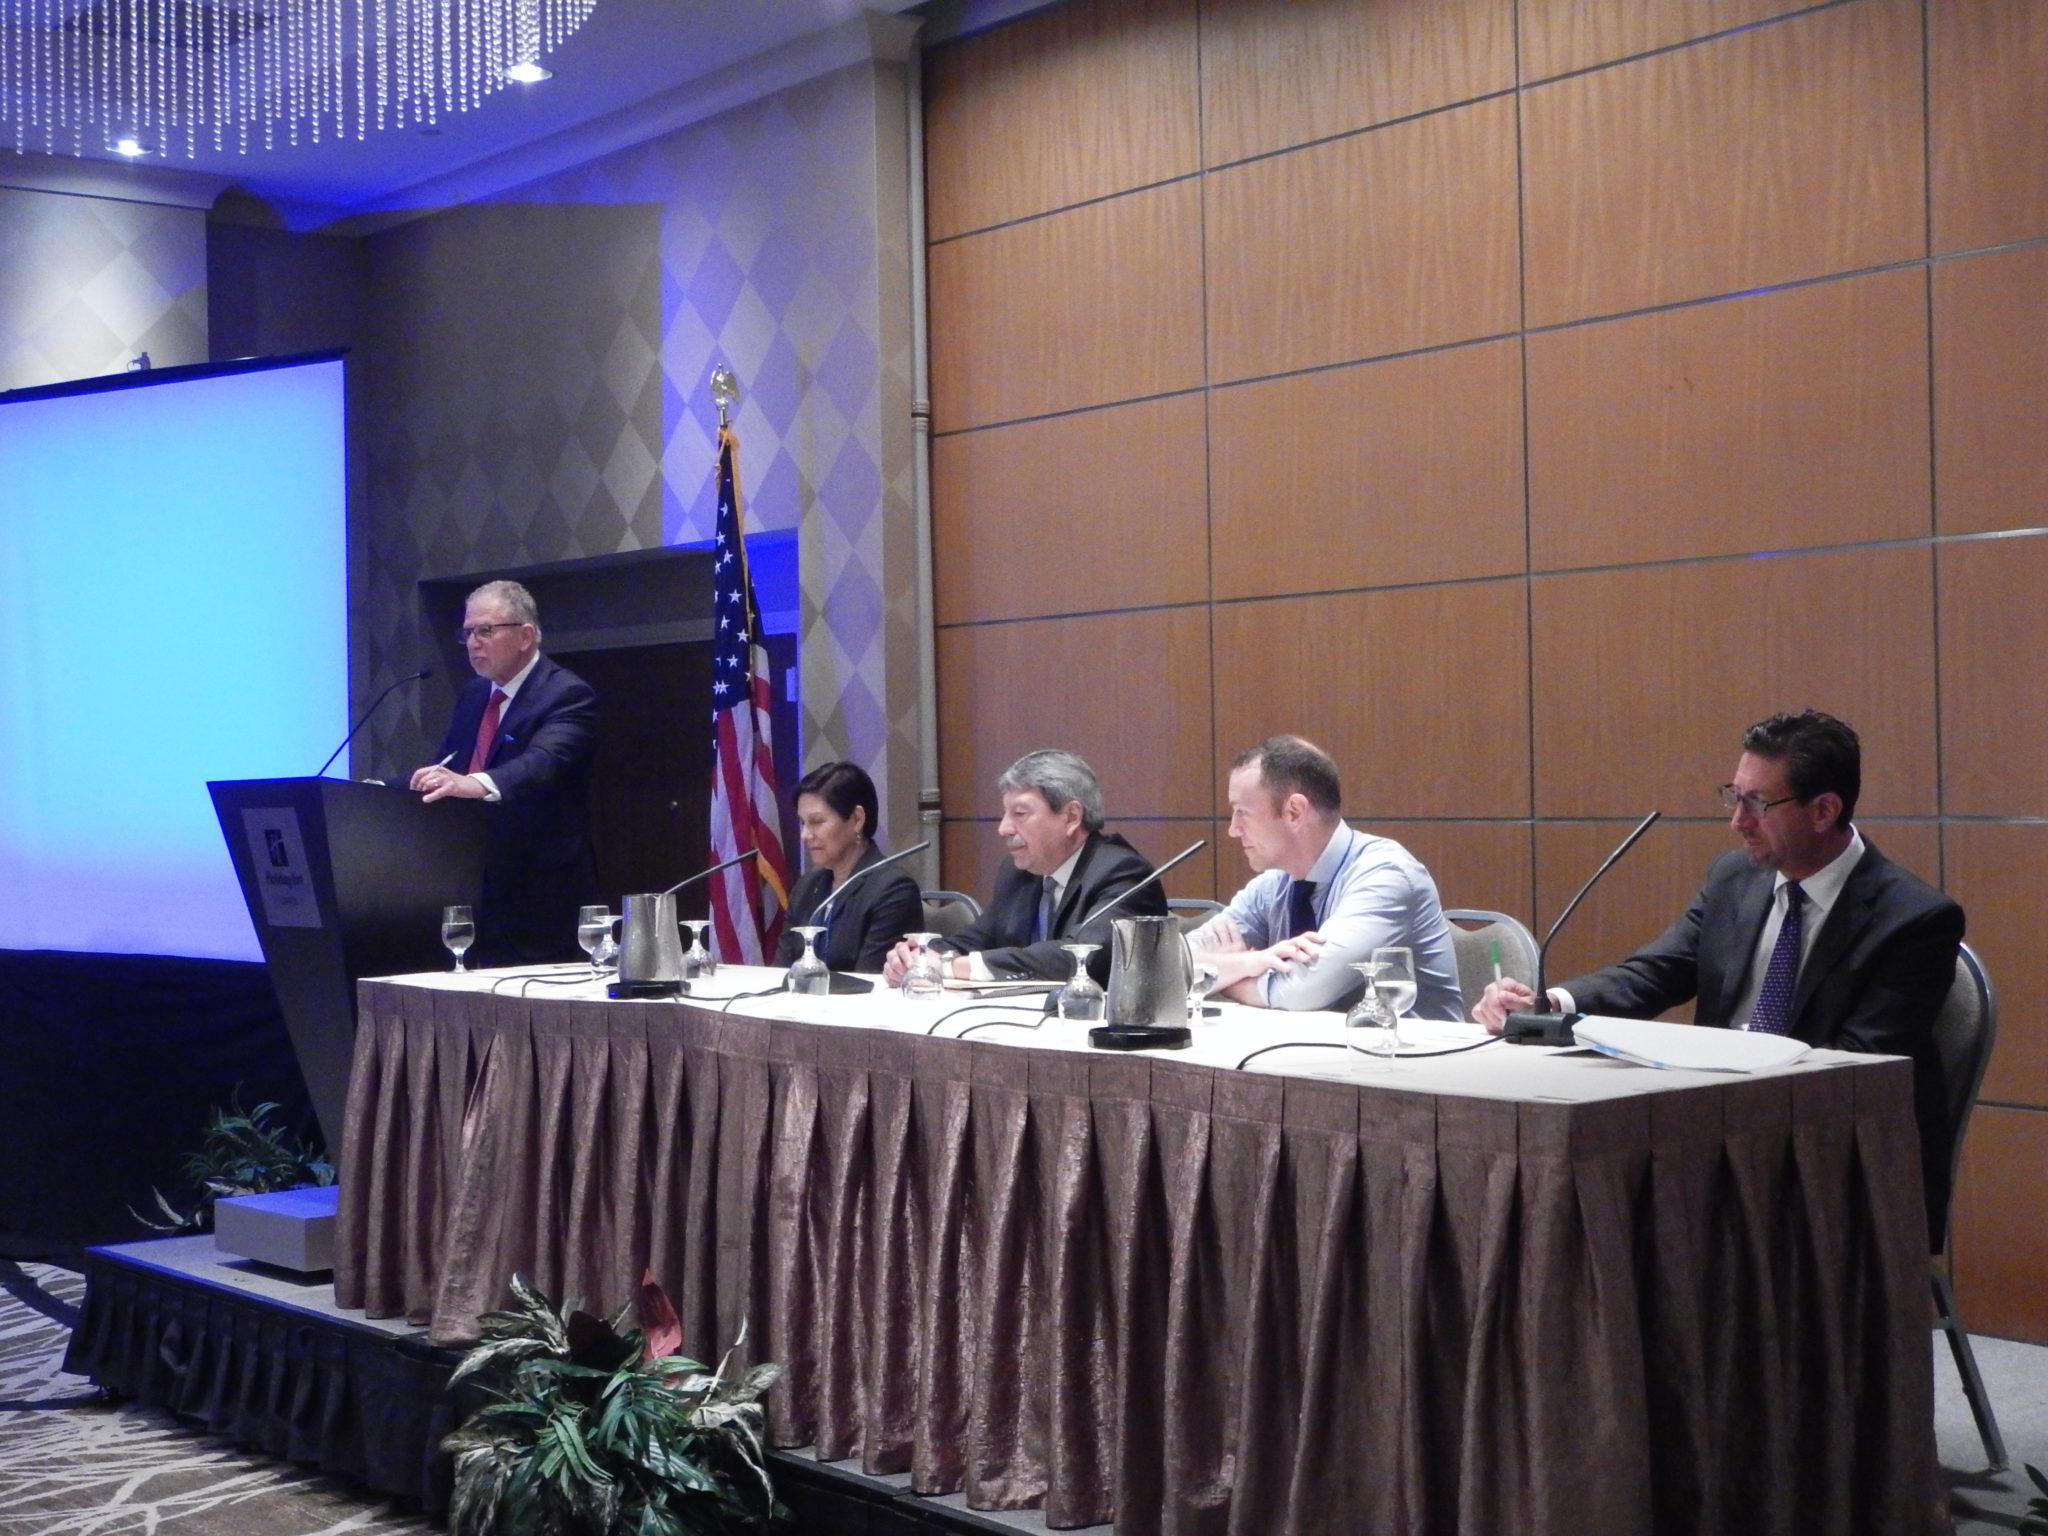 Mike Dworkin, Naomi Tsuda, Judge Montano, Judge Rawald, and Greg Winton; Photo by Robert L. Feldman